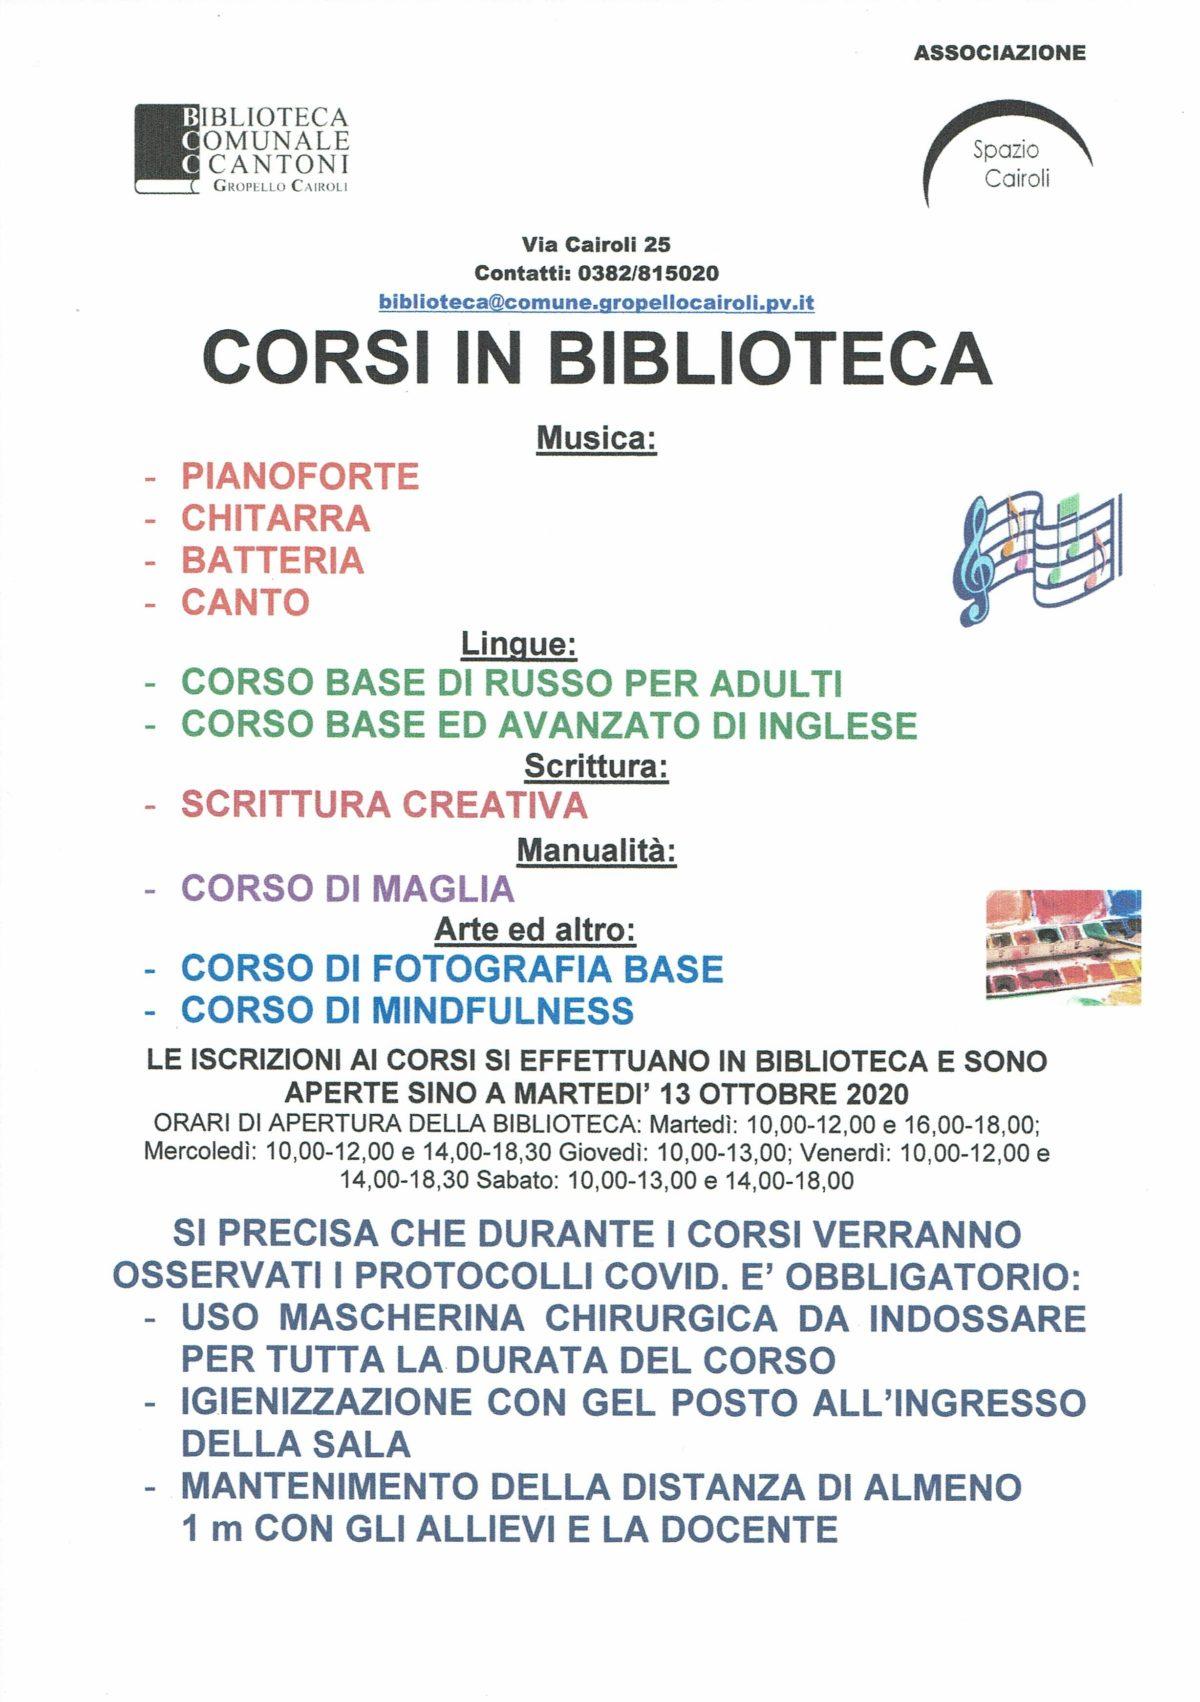 Biblioteca: Corsi in biblioteca 2020-2021